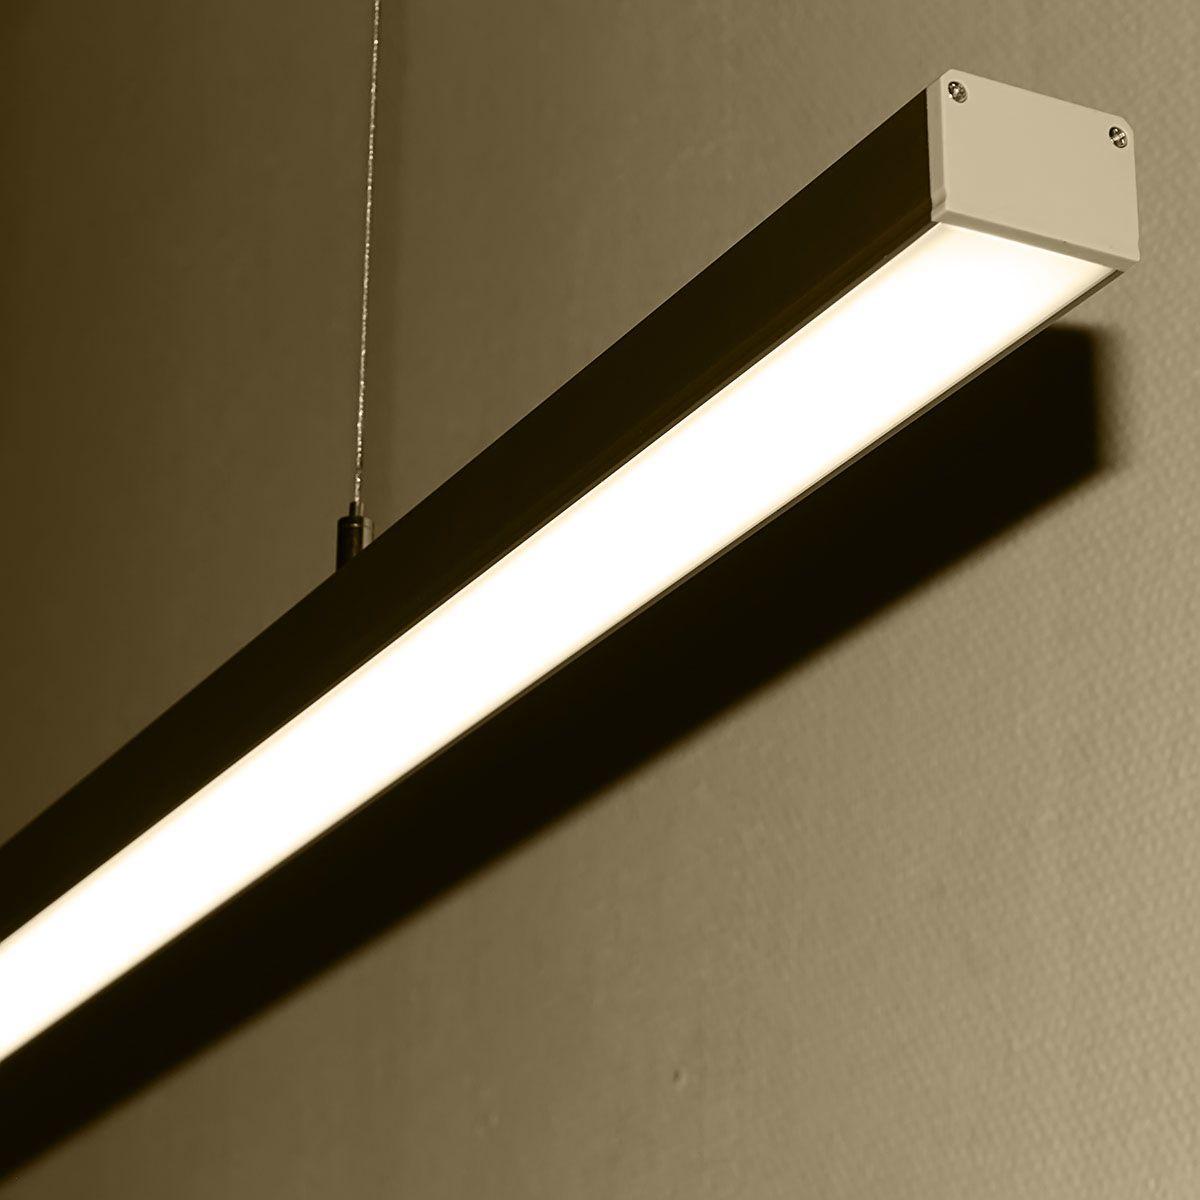 24V Aluminium LED Pendelleuchte – tageslichtweiß – linear – diffuse Abdeckung